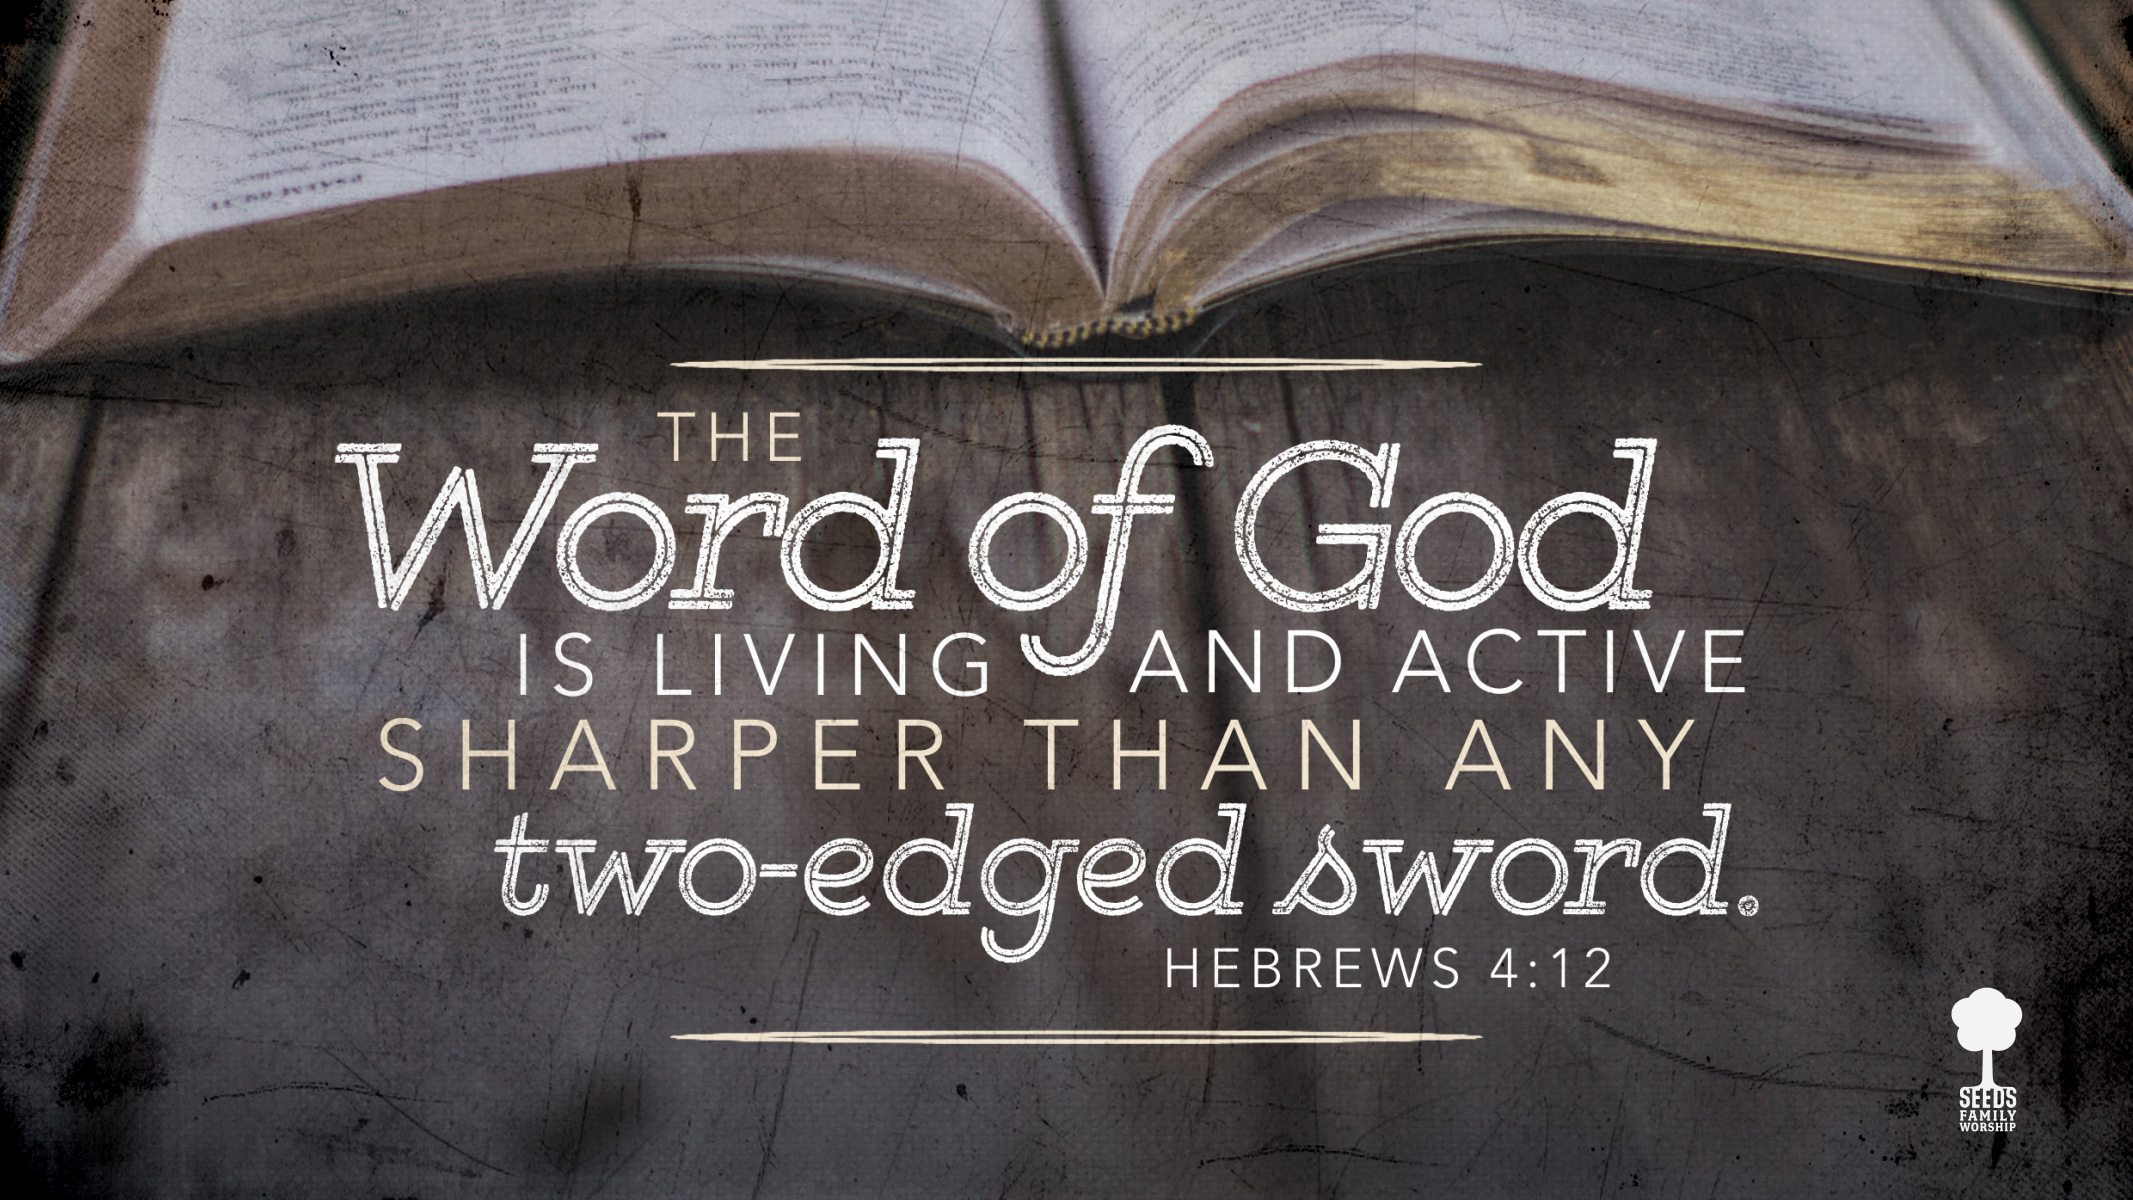 Fall Scripture Wallpaper Download Free Seeds Family Worship Desktop Backgrounds